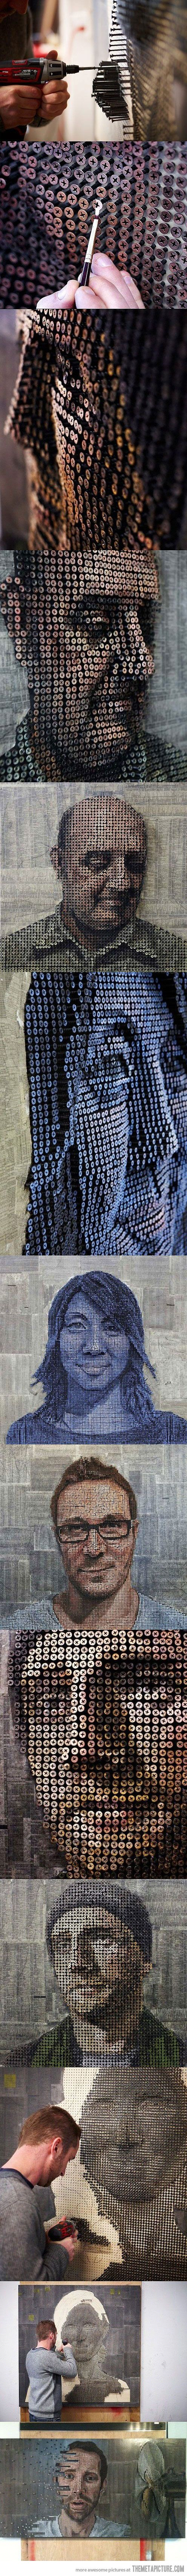 139 best Installation images on Pinterest | Art sculptures ...